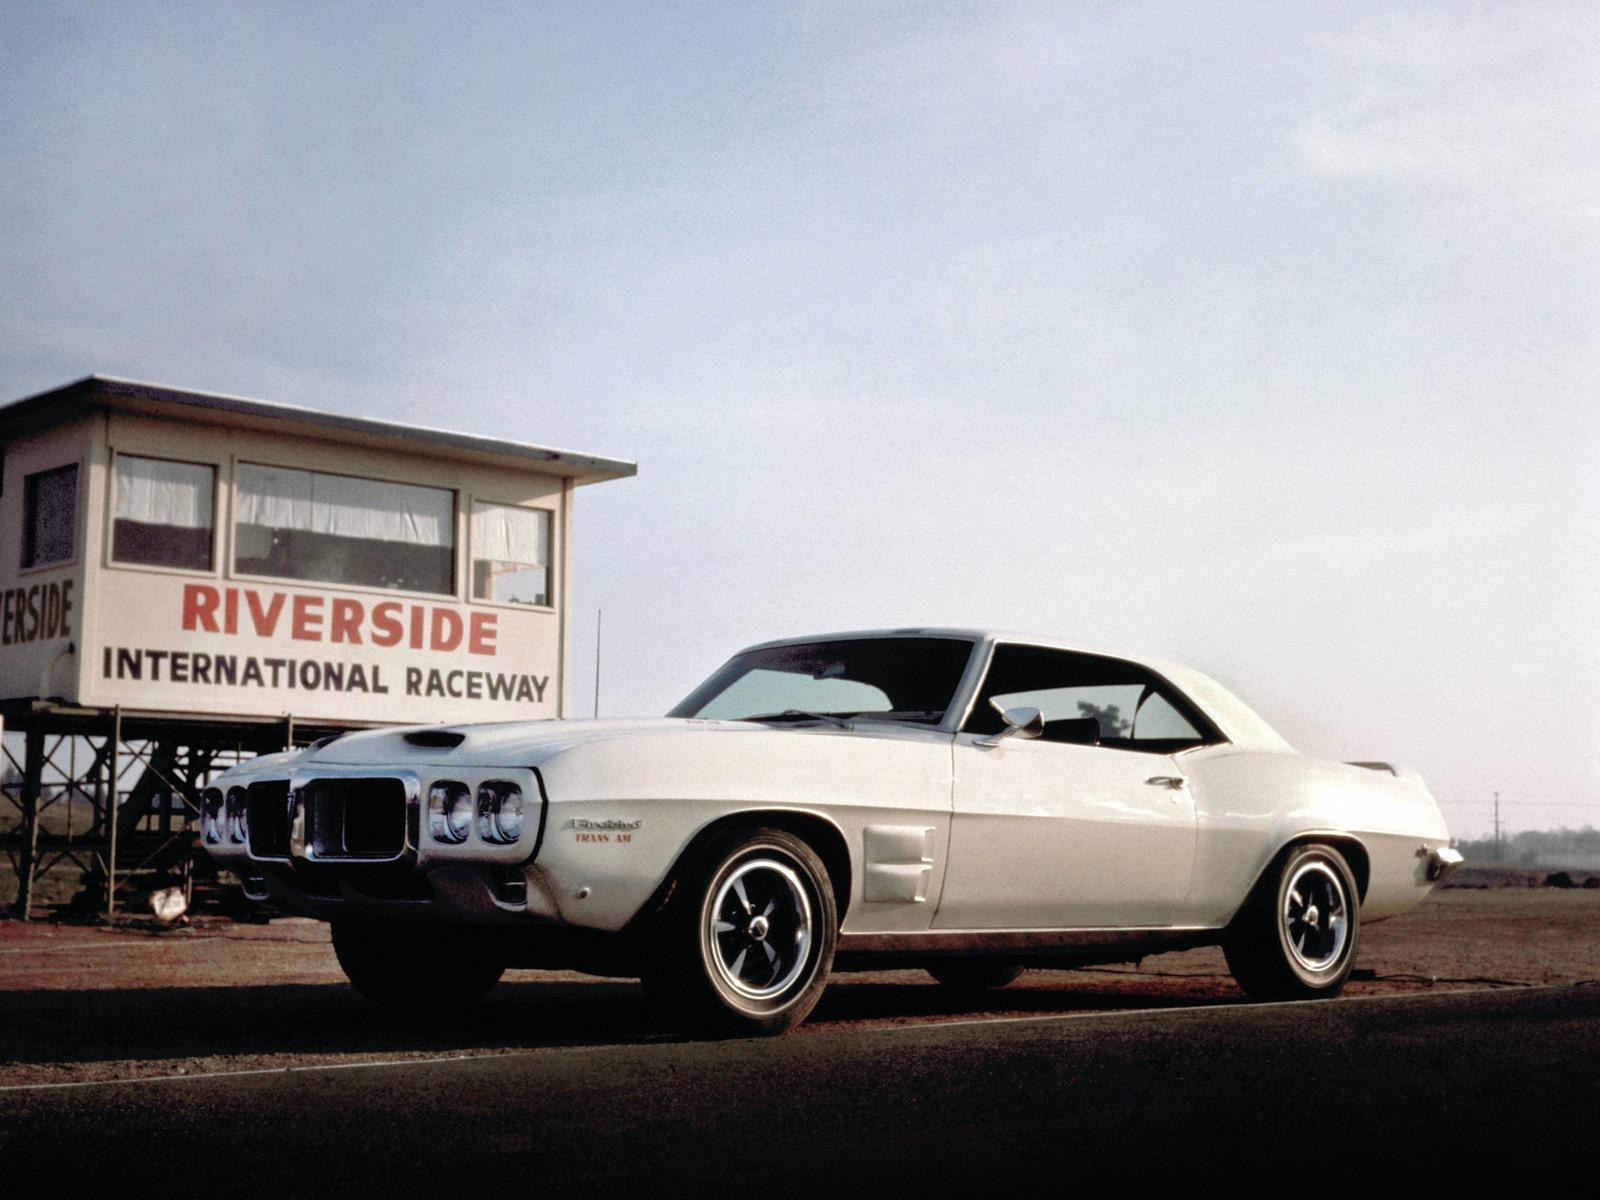 Pontiac Firebird Trans Am Prototype (1969) – Old Concept Cars